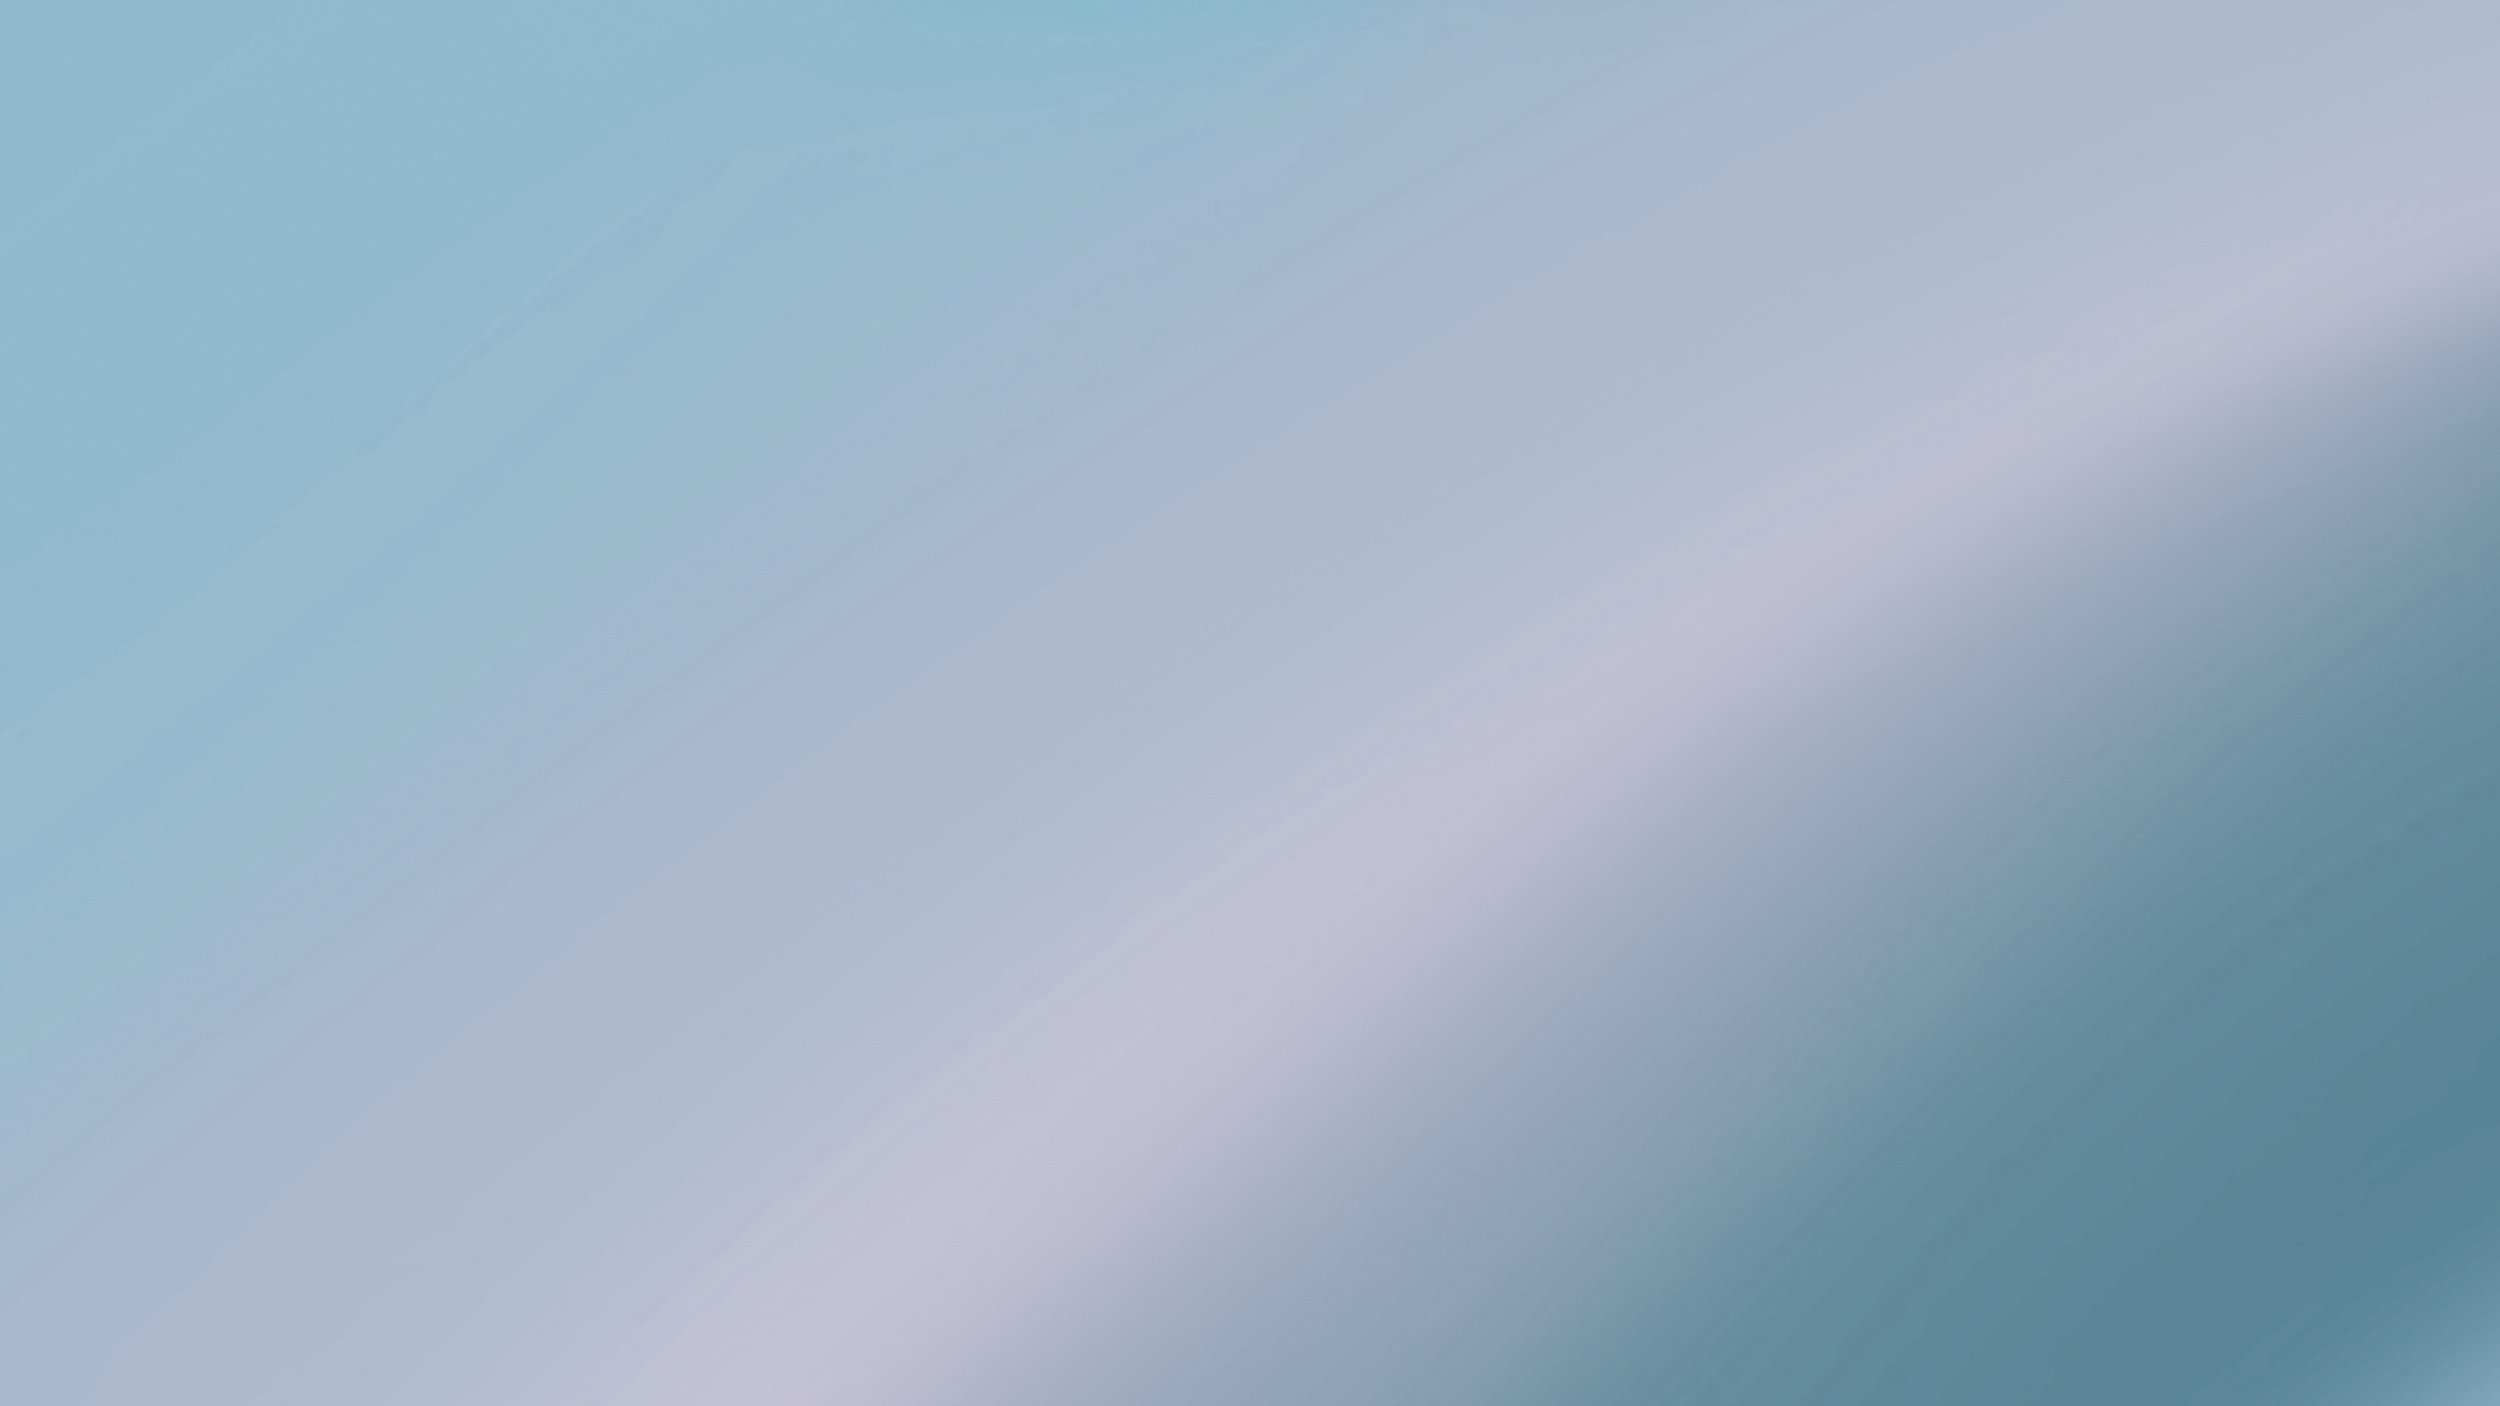 Minimal-Wallpaper-Gradient-for-Mac-Daniel-Romero-rmrdnl-4-1.jpg